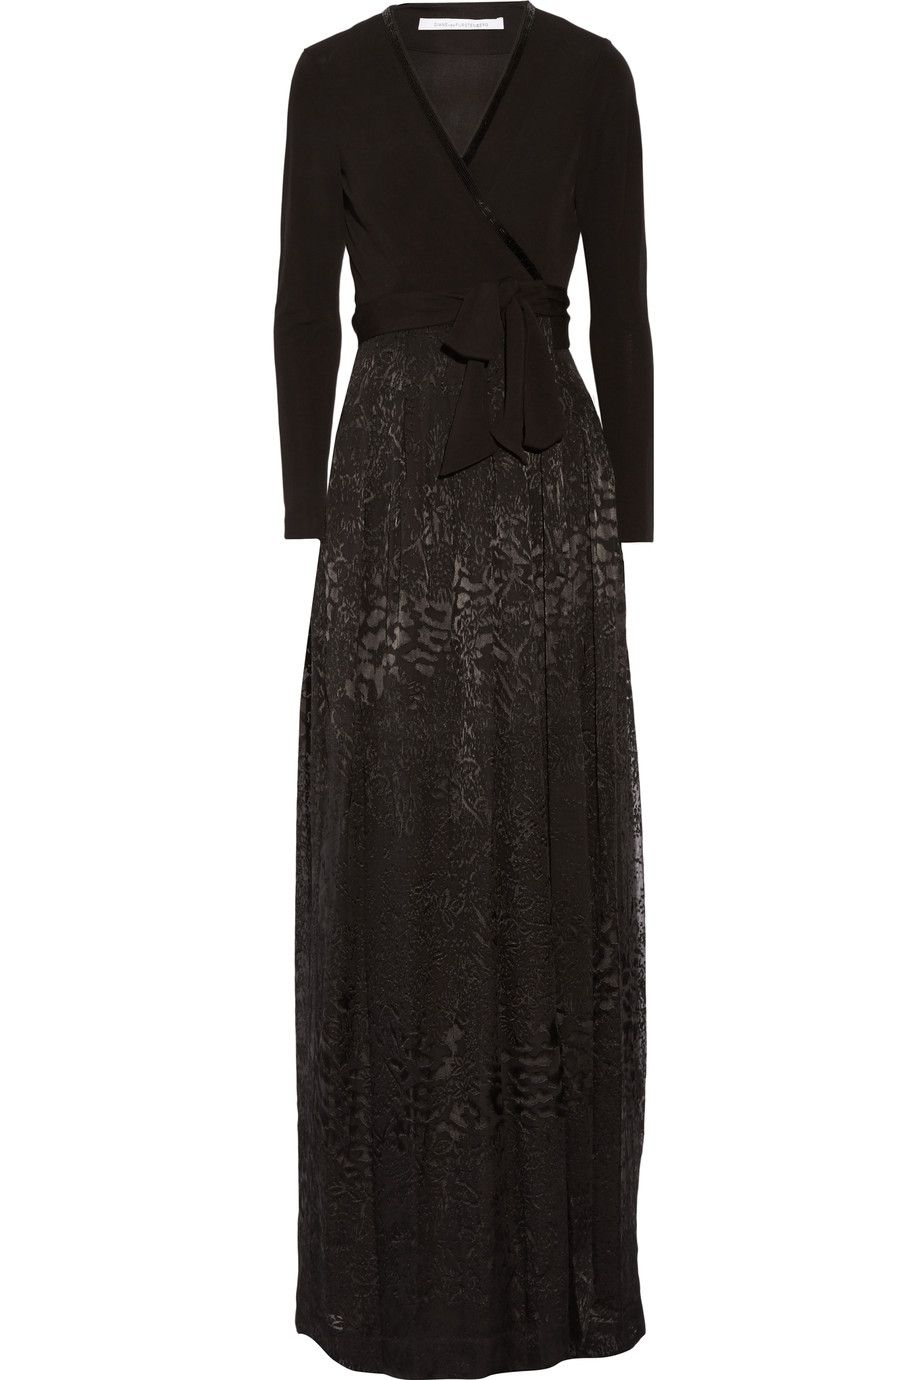 DIANE VON FURSTENBERG Kailey Wrap-Effect Flocked Silk-Blend And Crepe Maxi Dress. #dianevonfurstenberg #cloth #dress